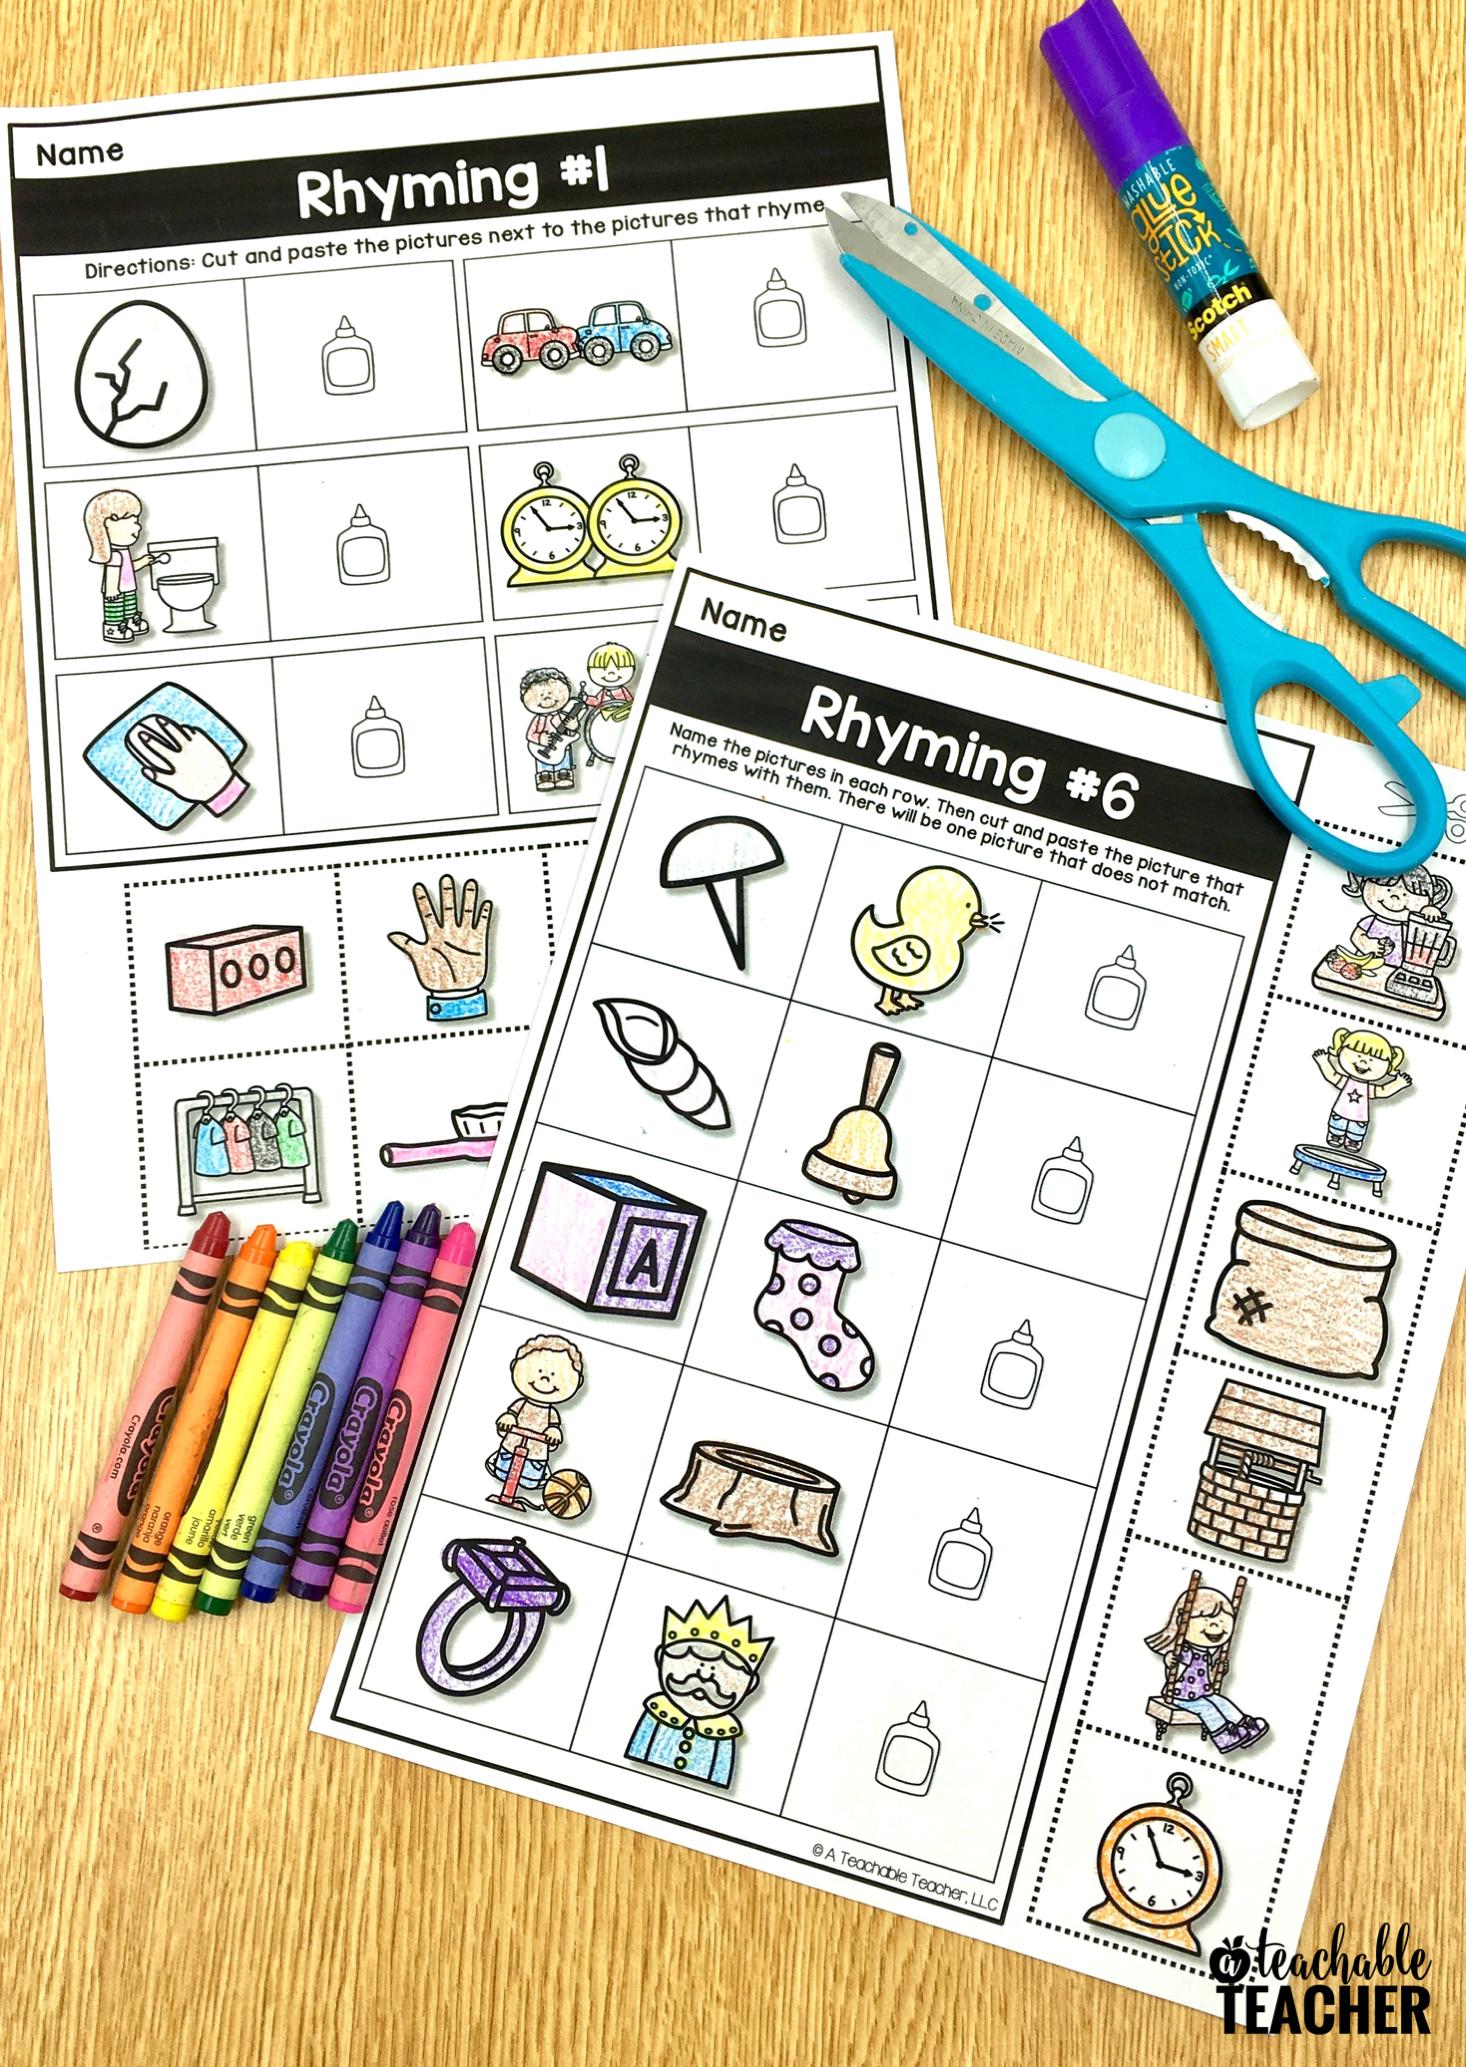 Free Phonemic Awareness Worksheets Interactive And Picture Based Preschool Worksheets Rhyming Activities Phonemic Awareness [ 2067 x 1466 Pixel ]